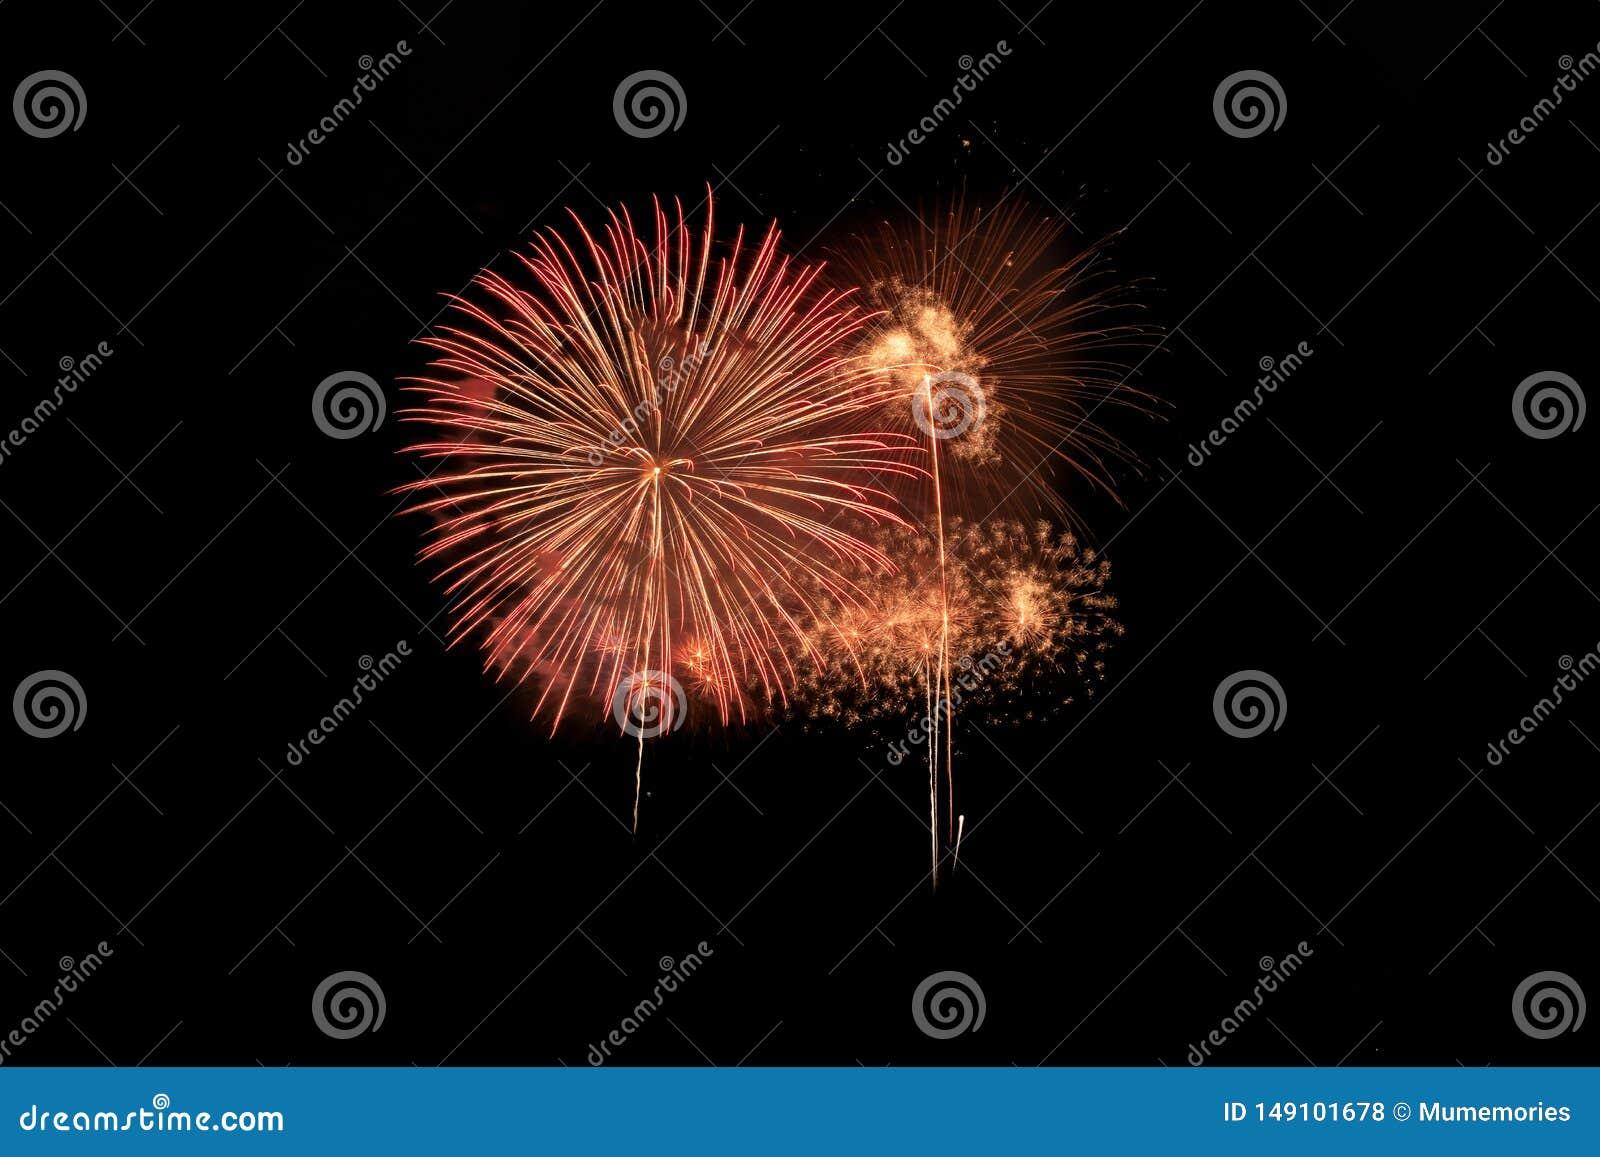 Explos?o colorida dos fogos de artif?cio no festival anual